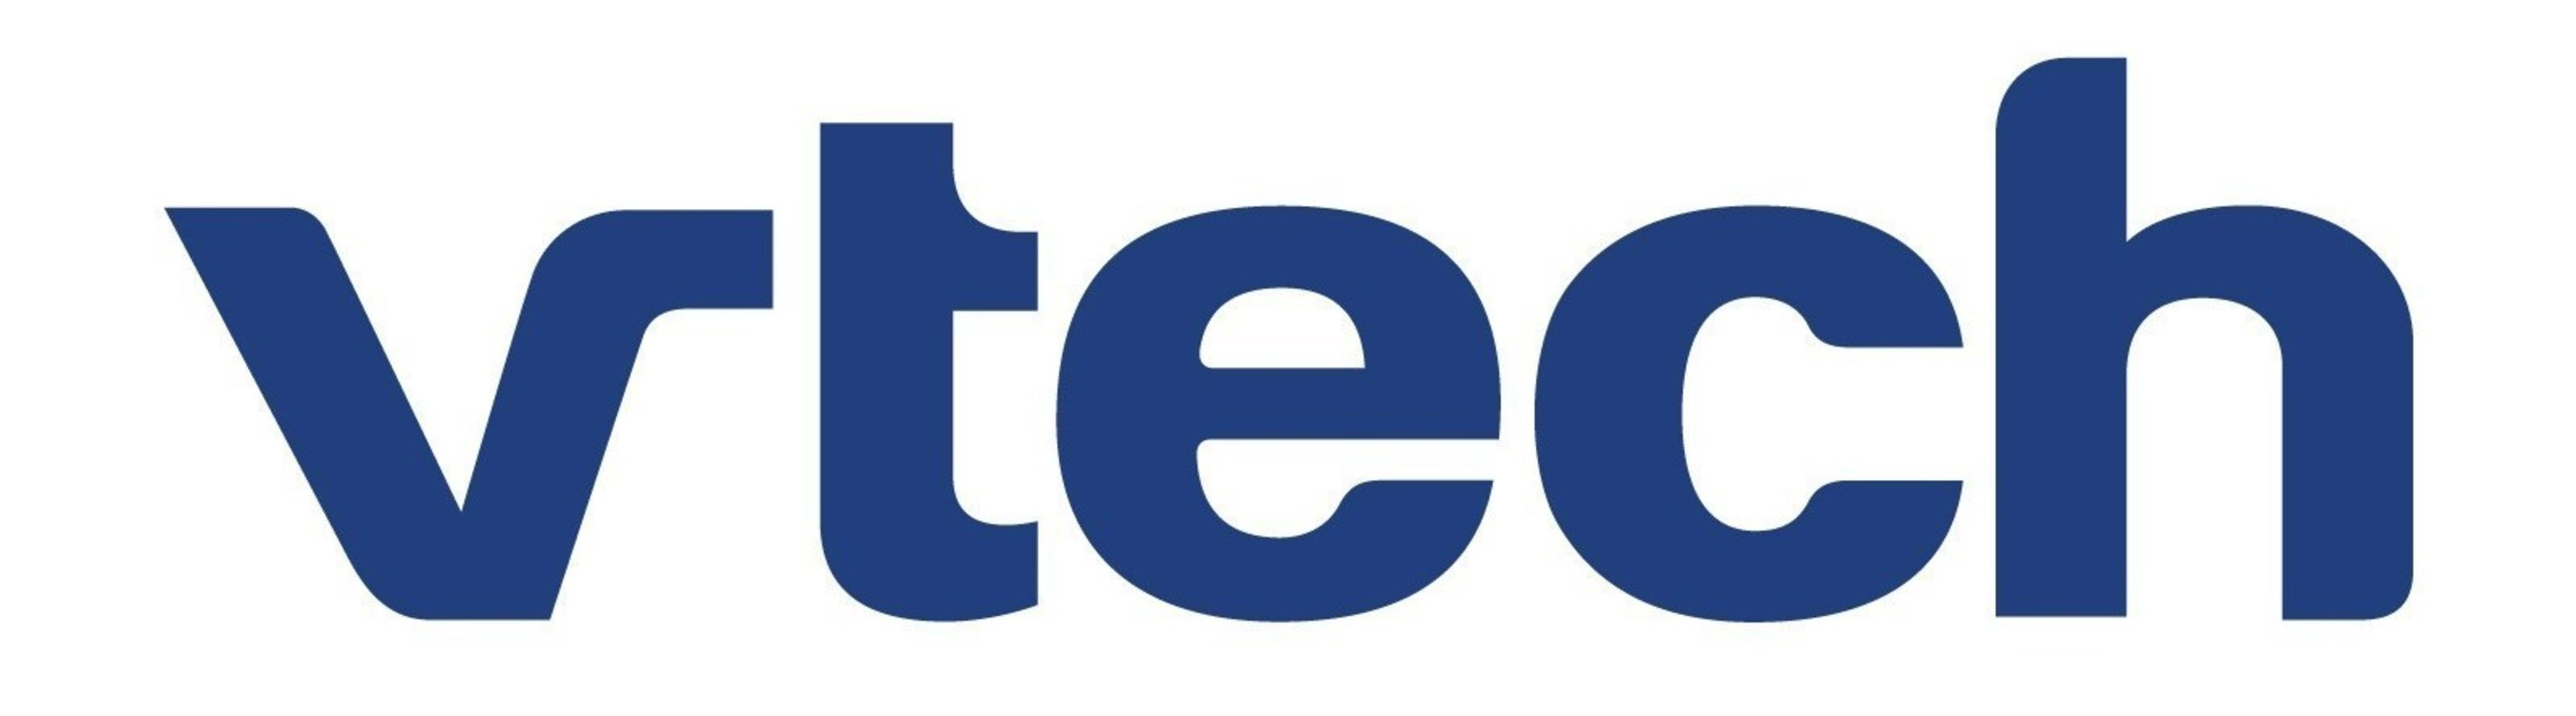 VTech Announces 2016/2017 Interim Results